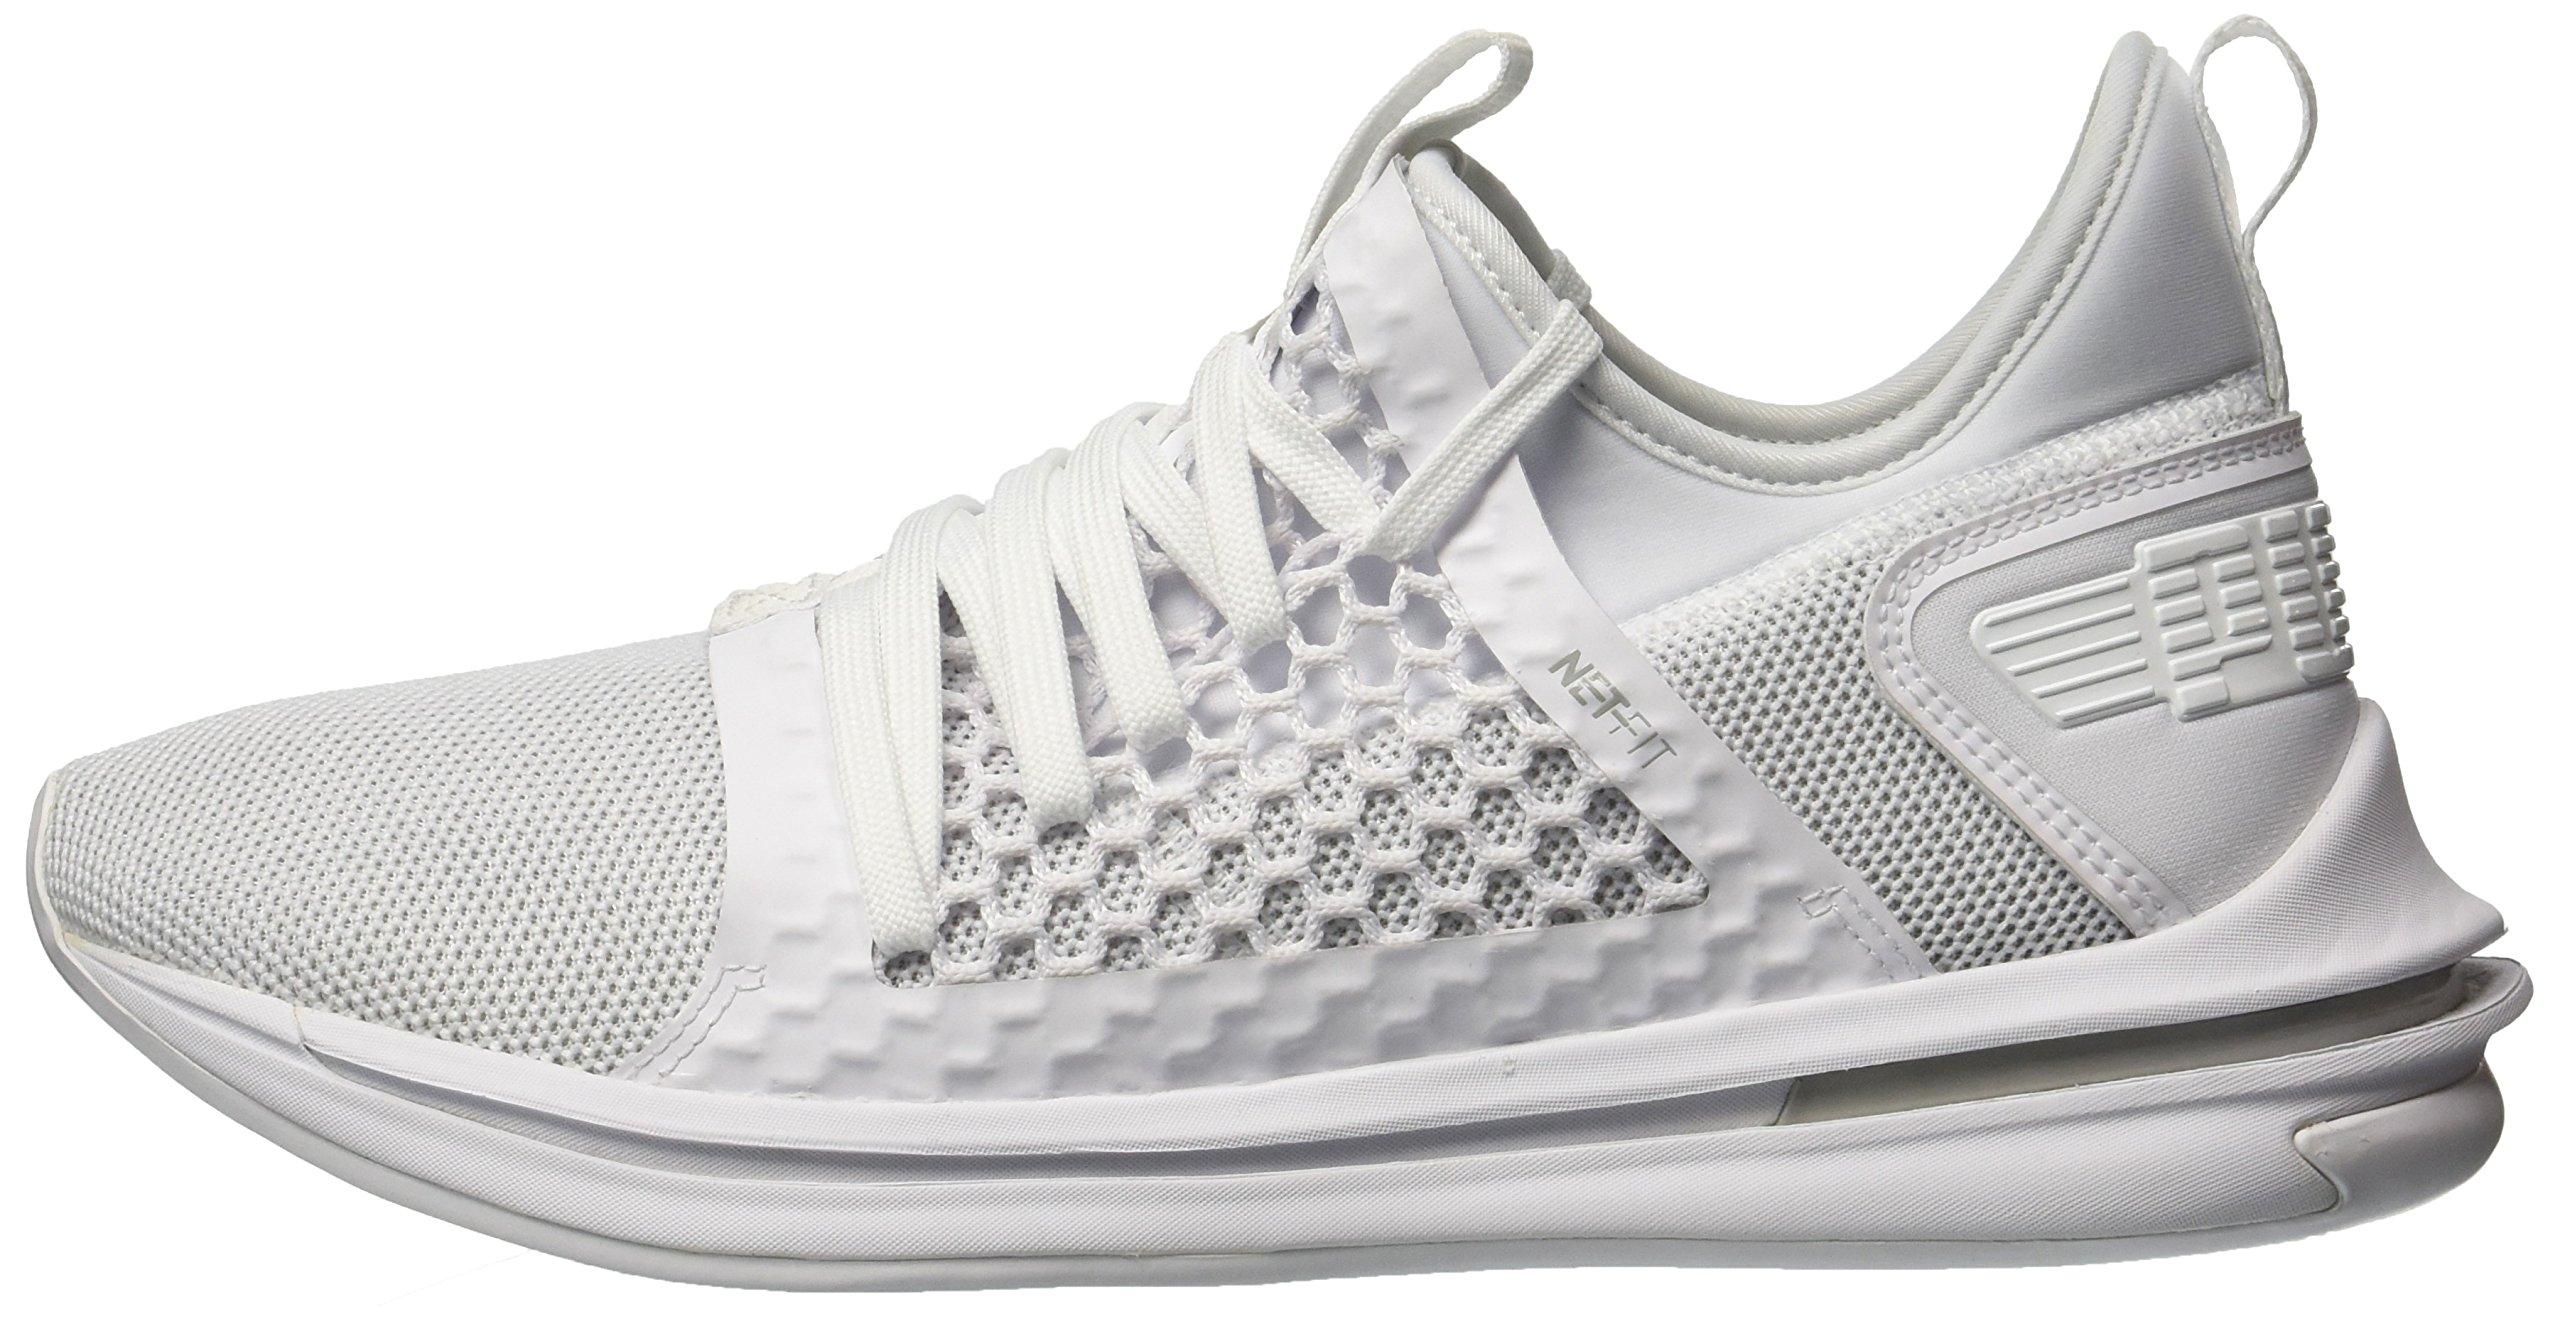 PUMA Men s Ignite Limitless SR Netfit Sneaker 486e48a03